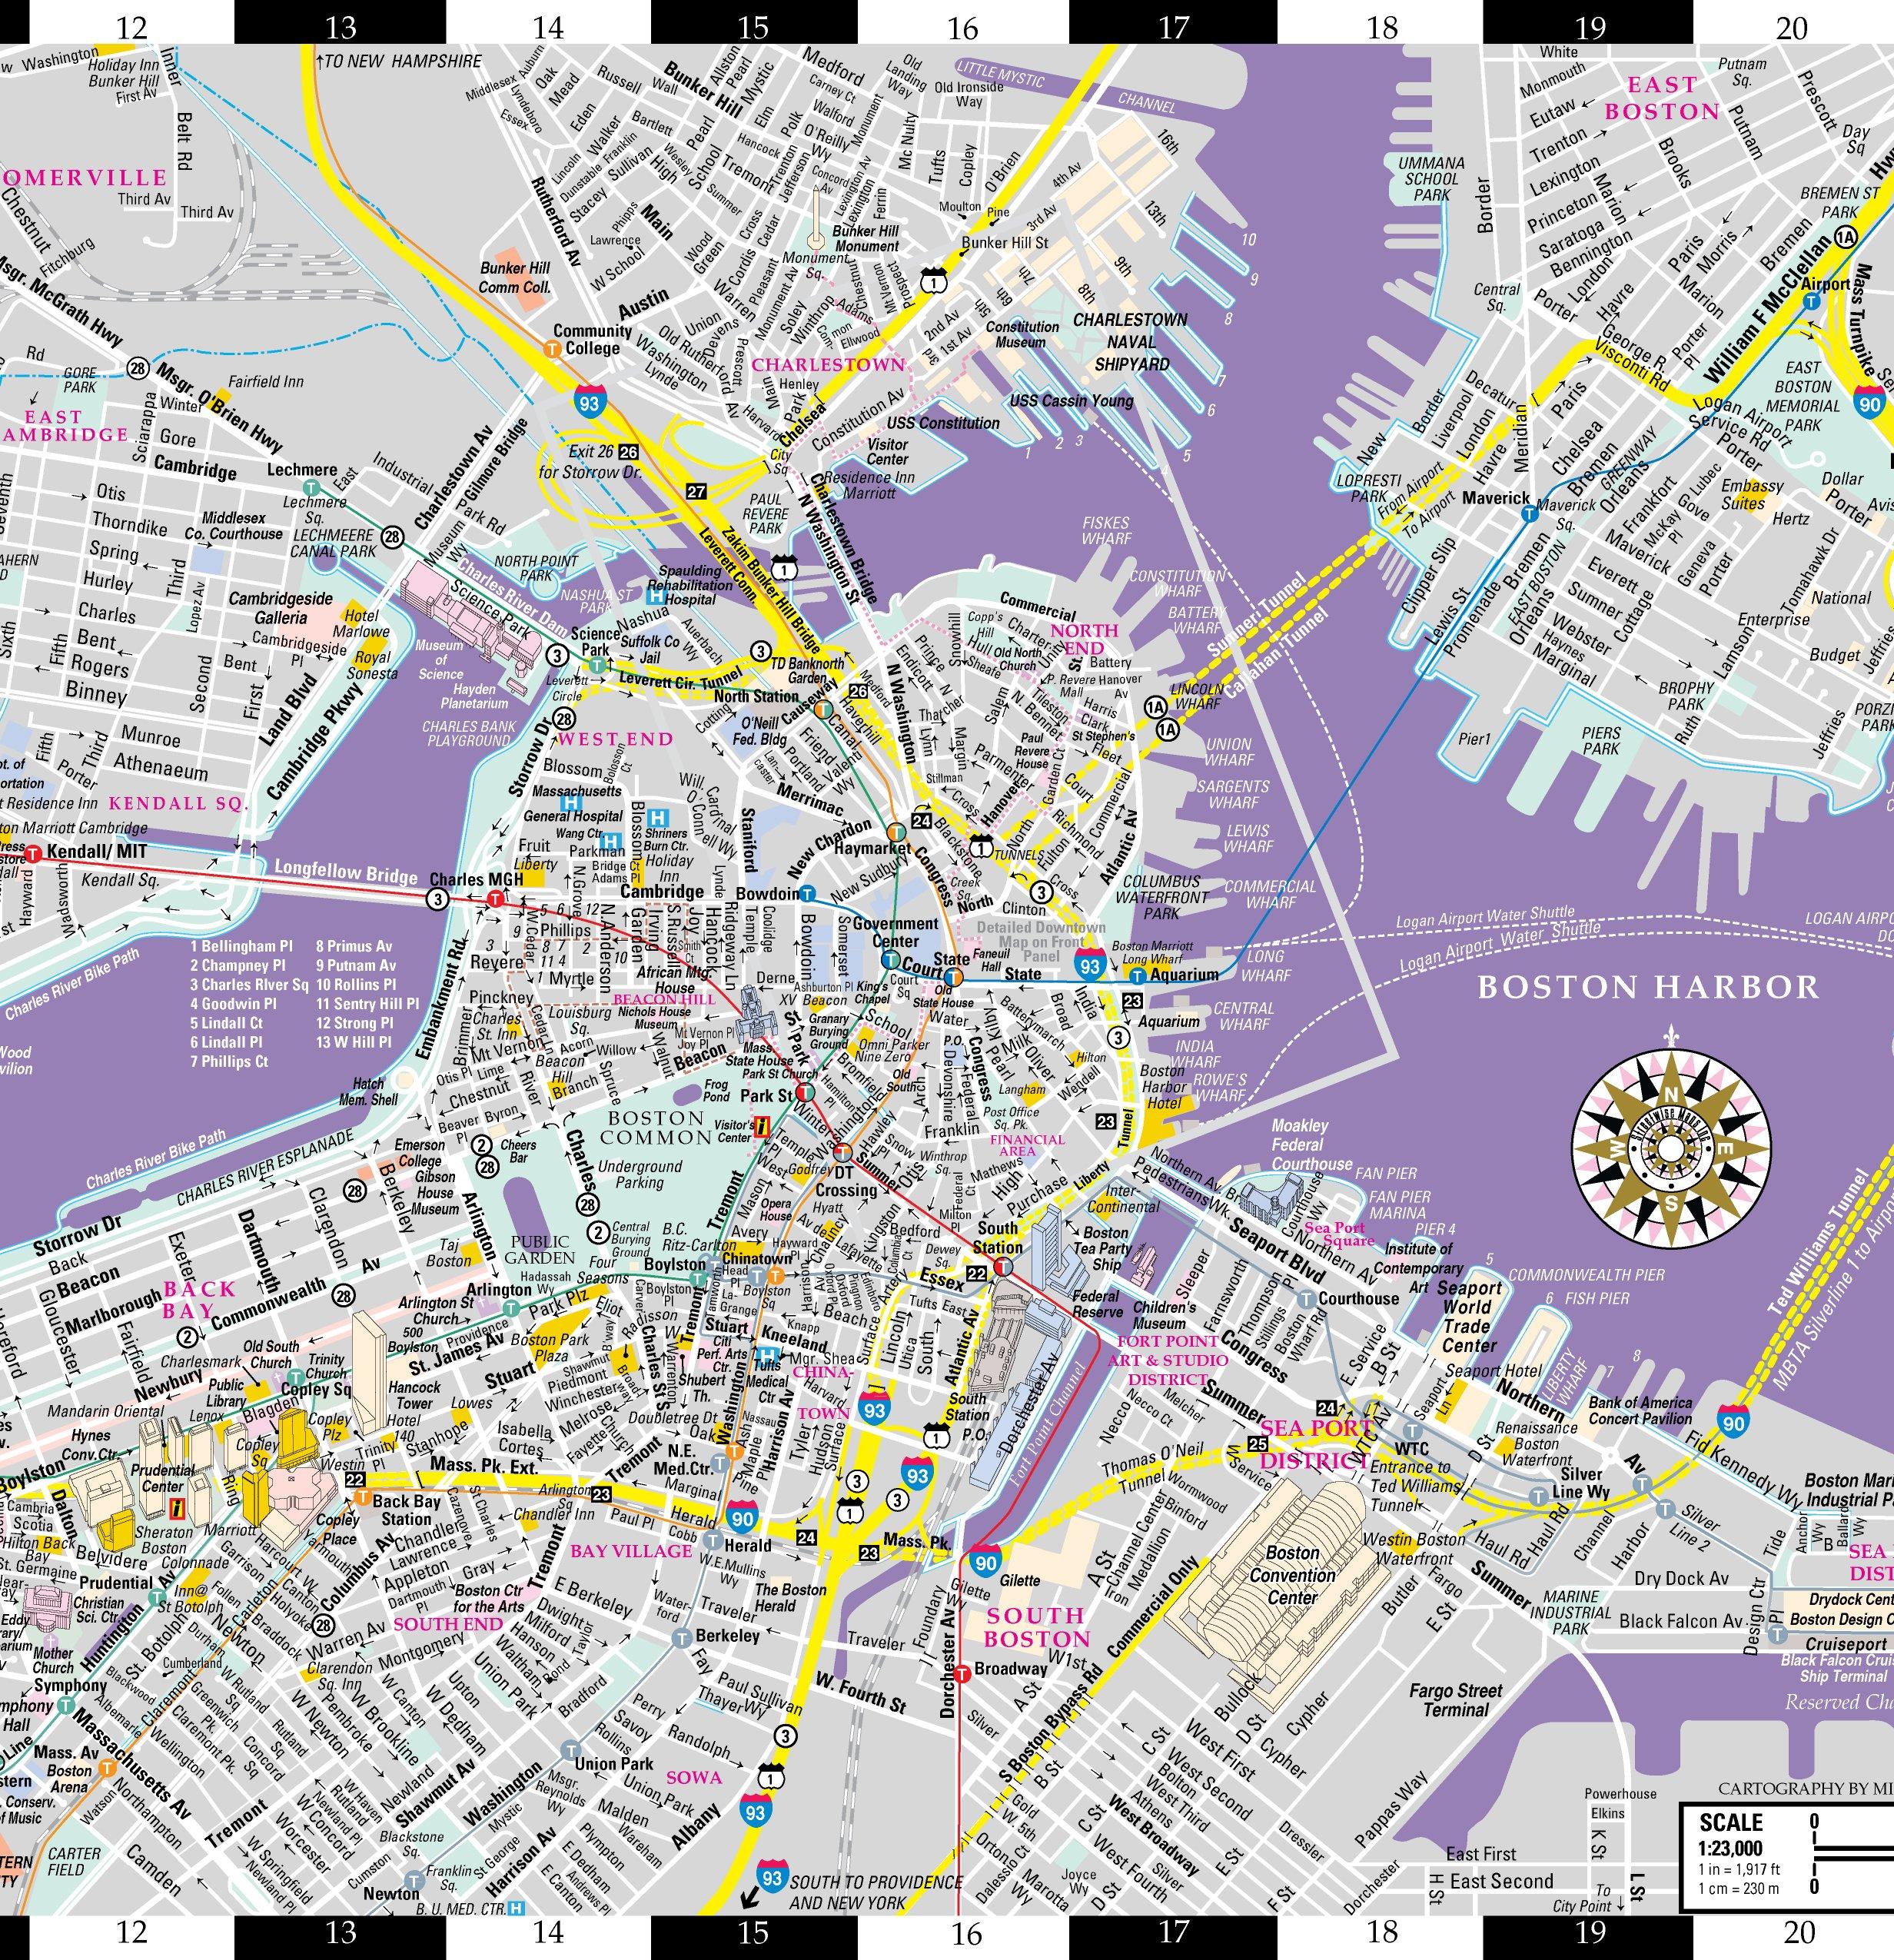 Streetwise Boston Map Laminated City Center Street Map Of Boston - Map of boston vicinity